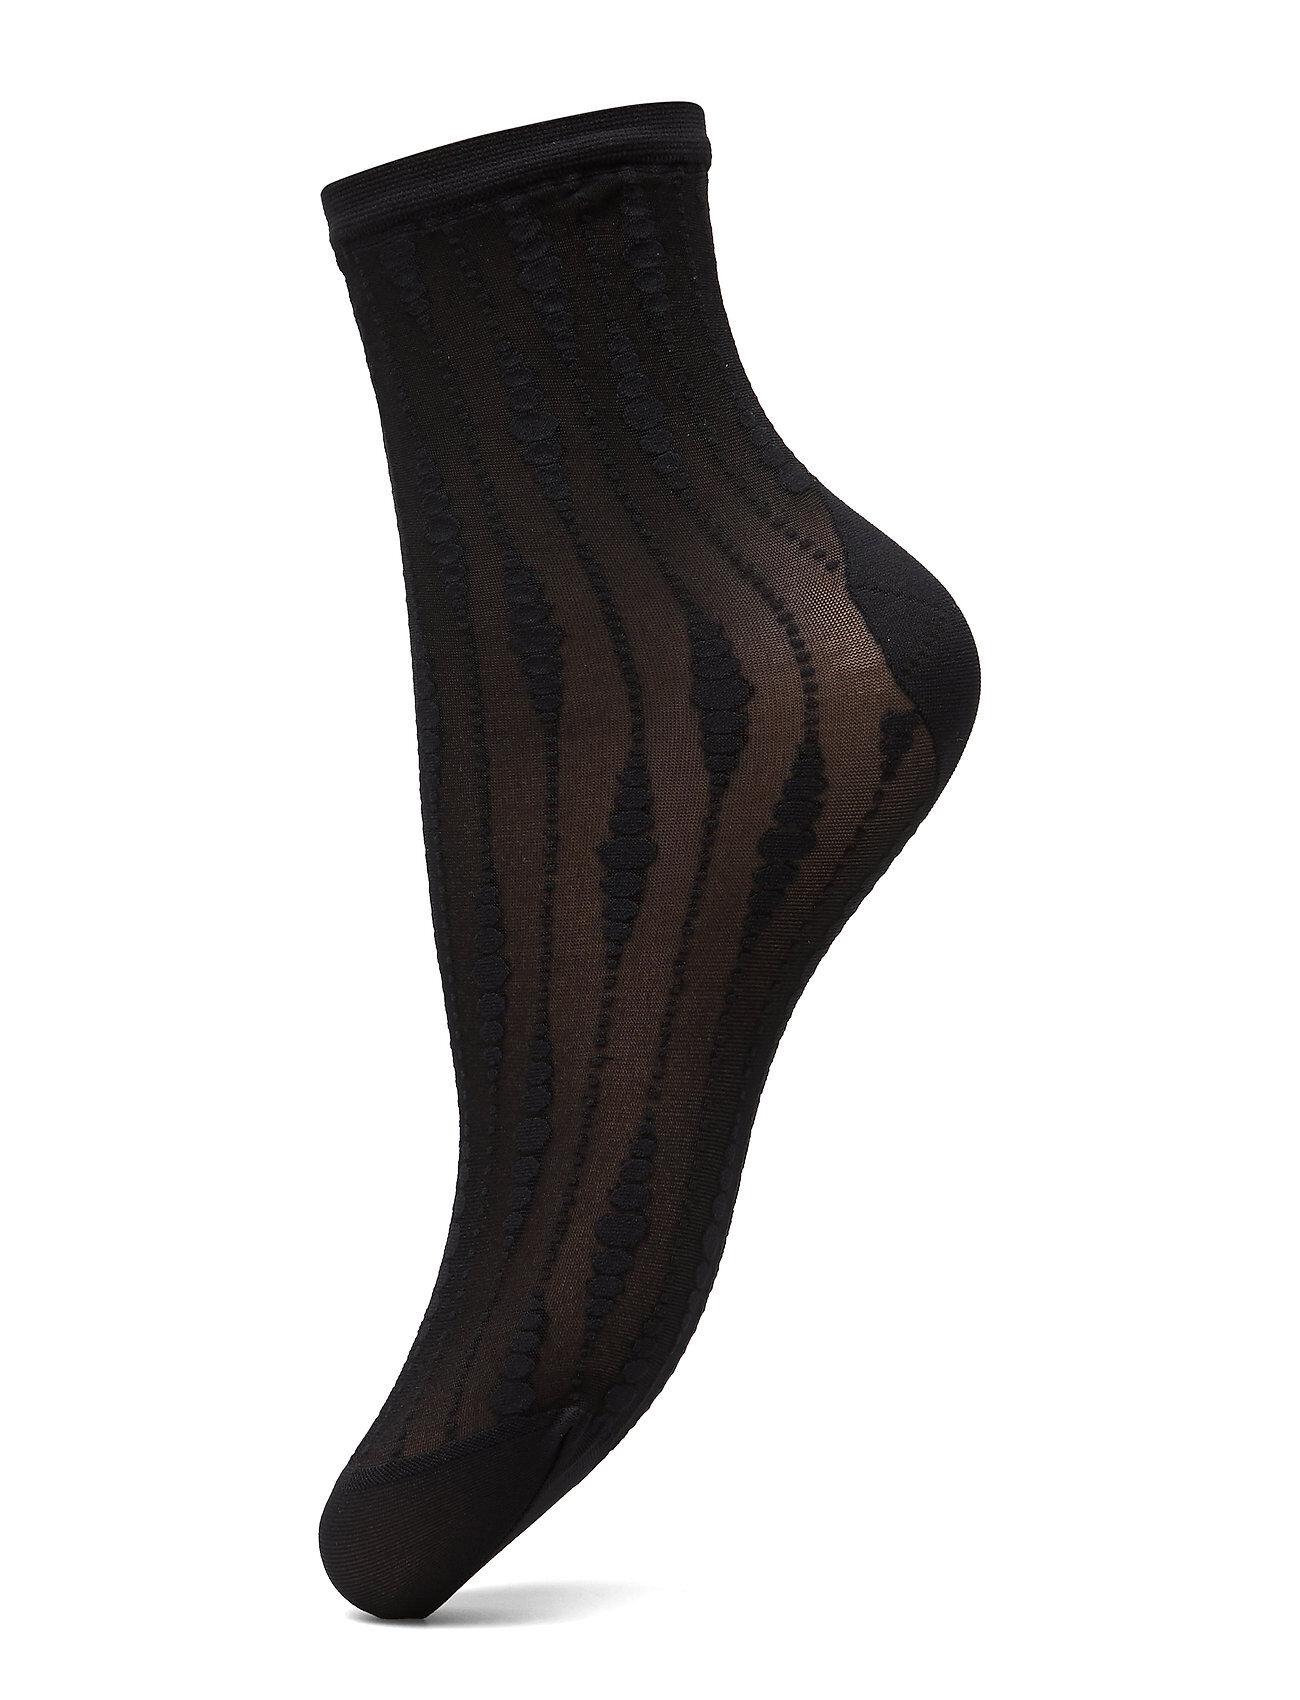 Swedish Stockings Josefin Drop Socks 20 Den Lingerie Hosiery Socks Musta Swedish Stockings